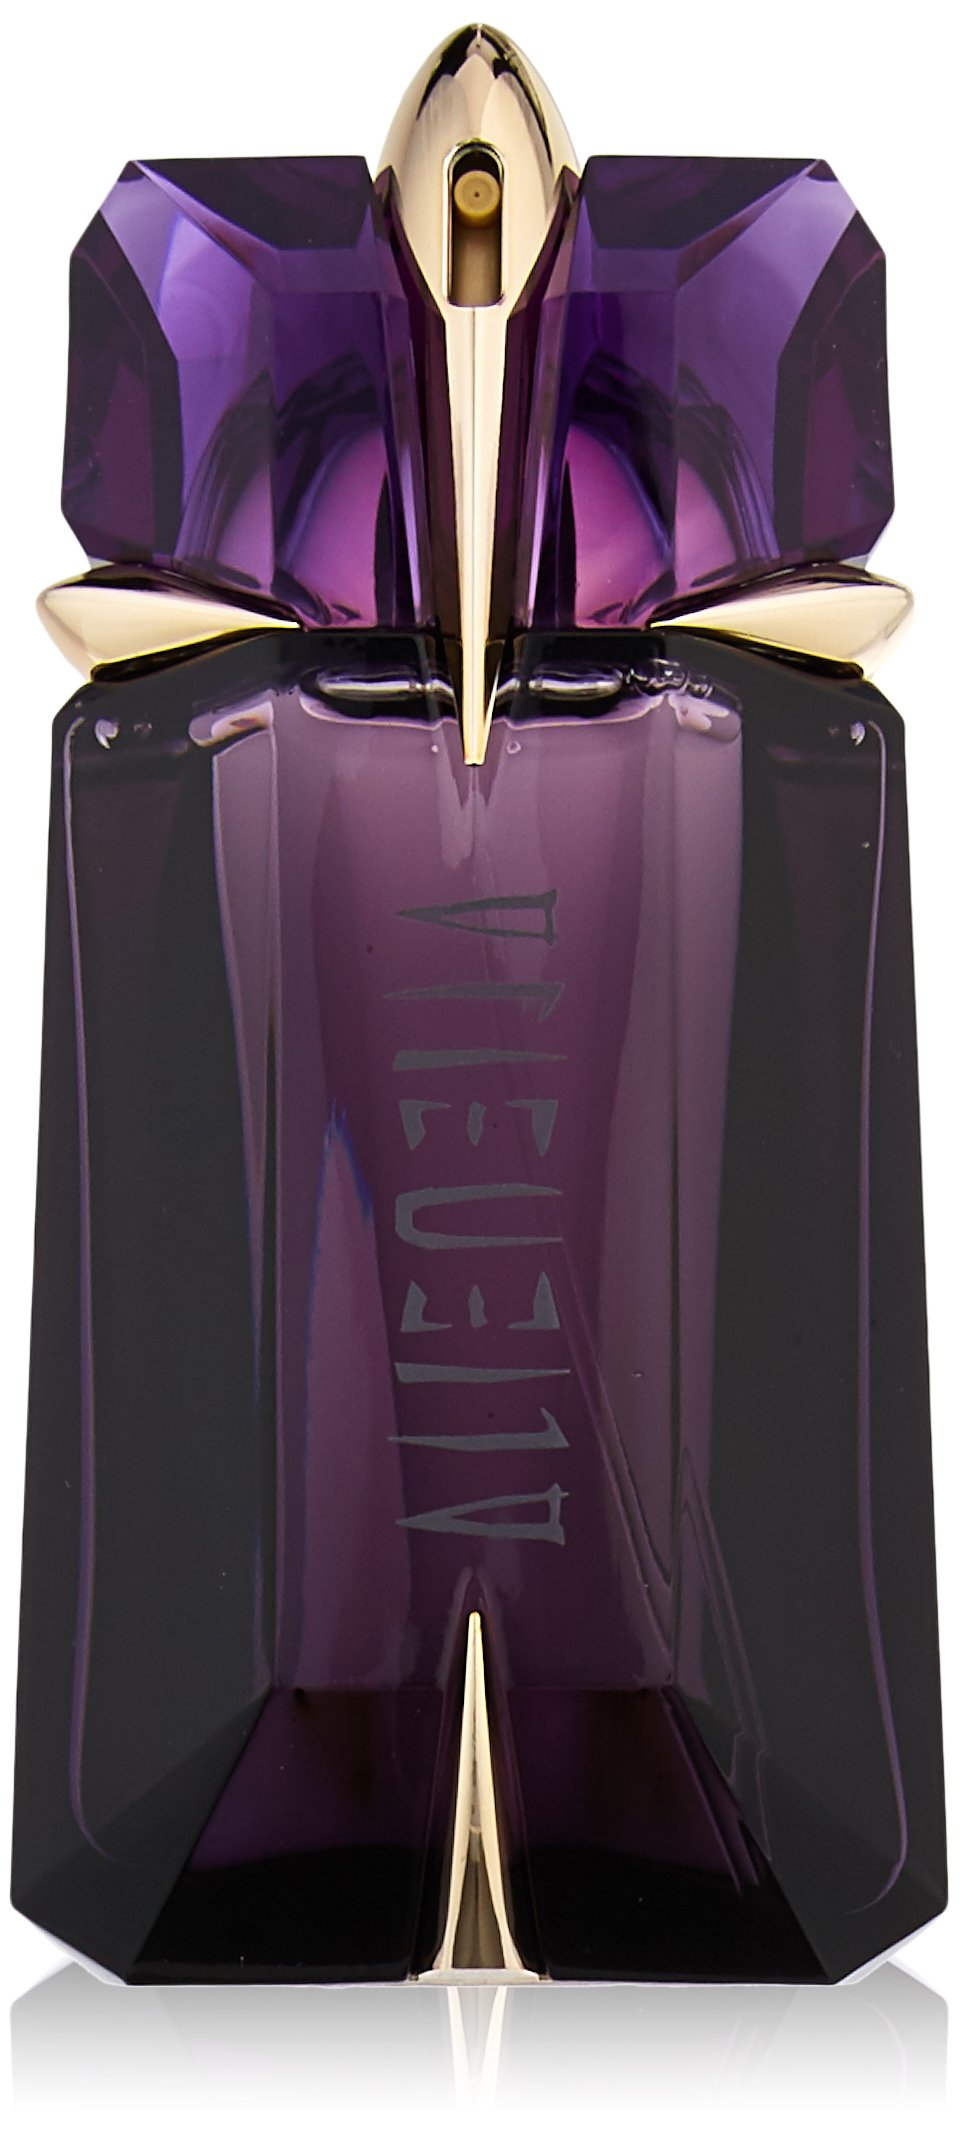 Thierry Mugler Alien 2 oz Eau De Parfum Refillable Spray For Women